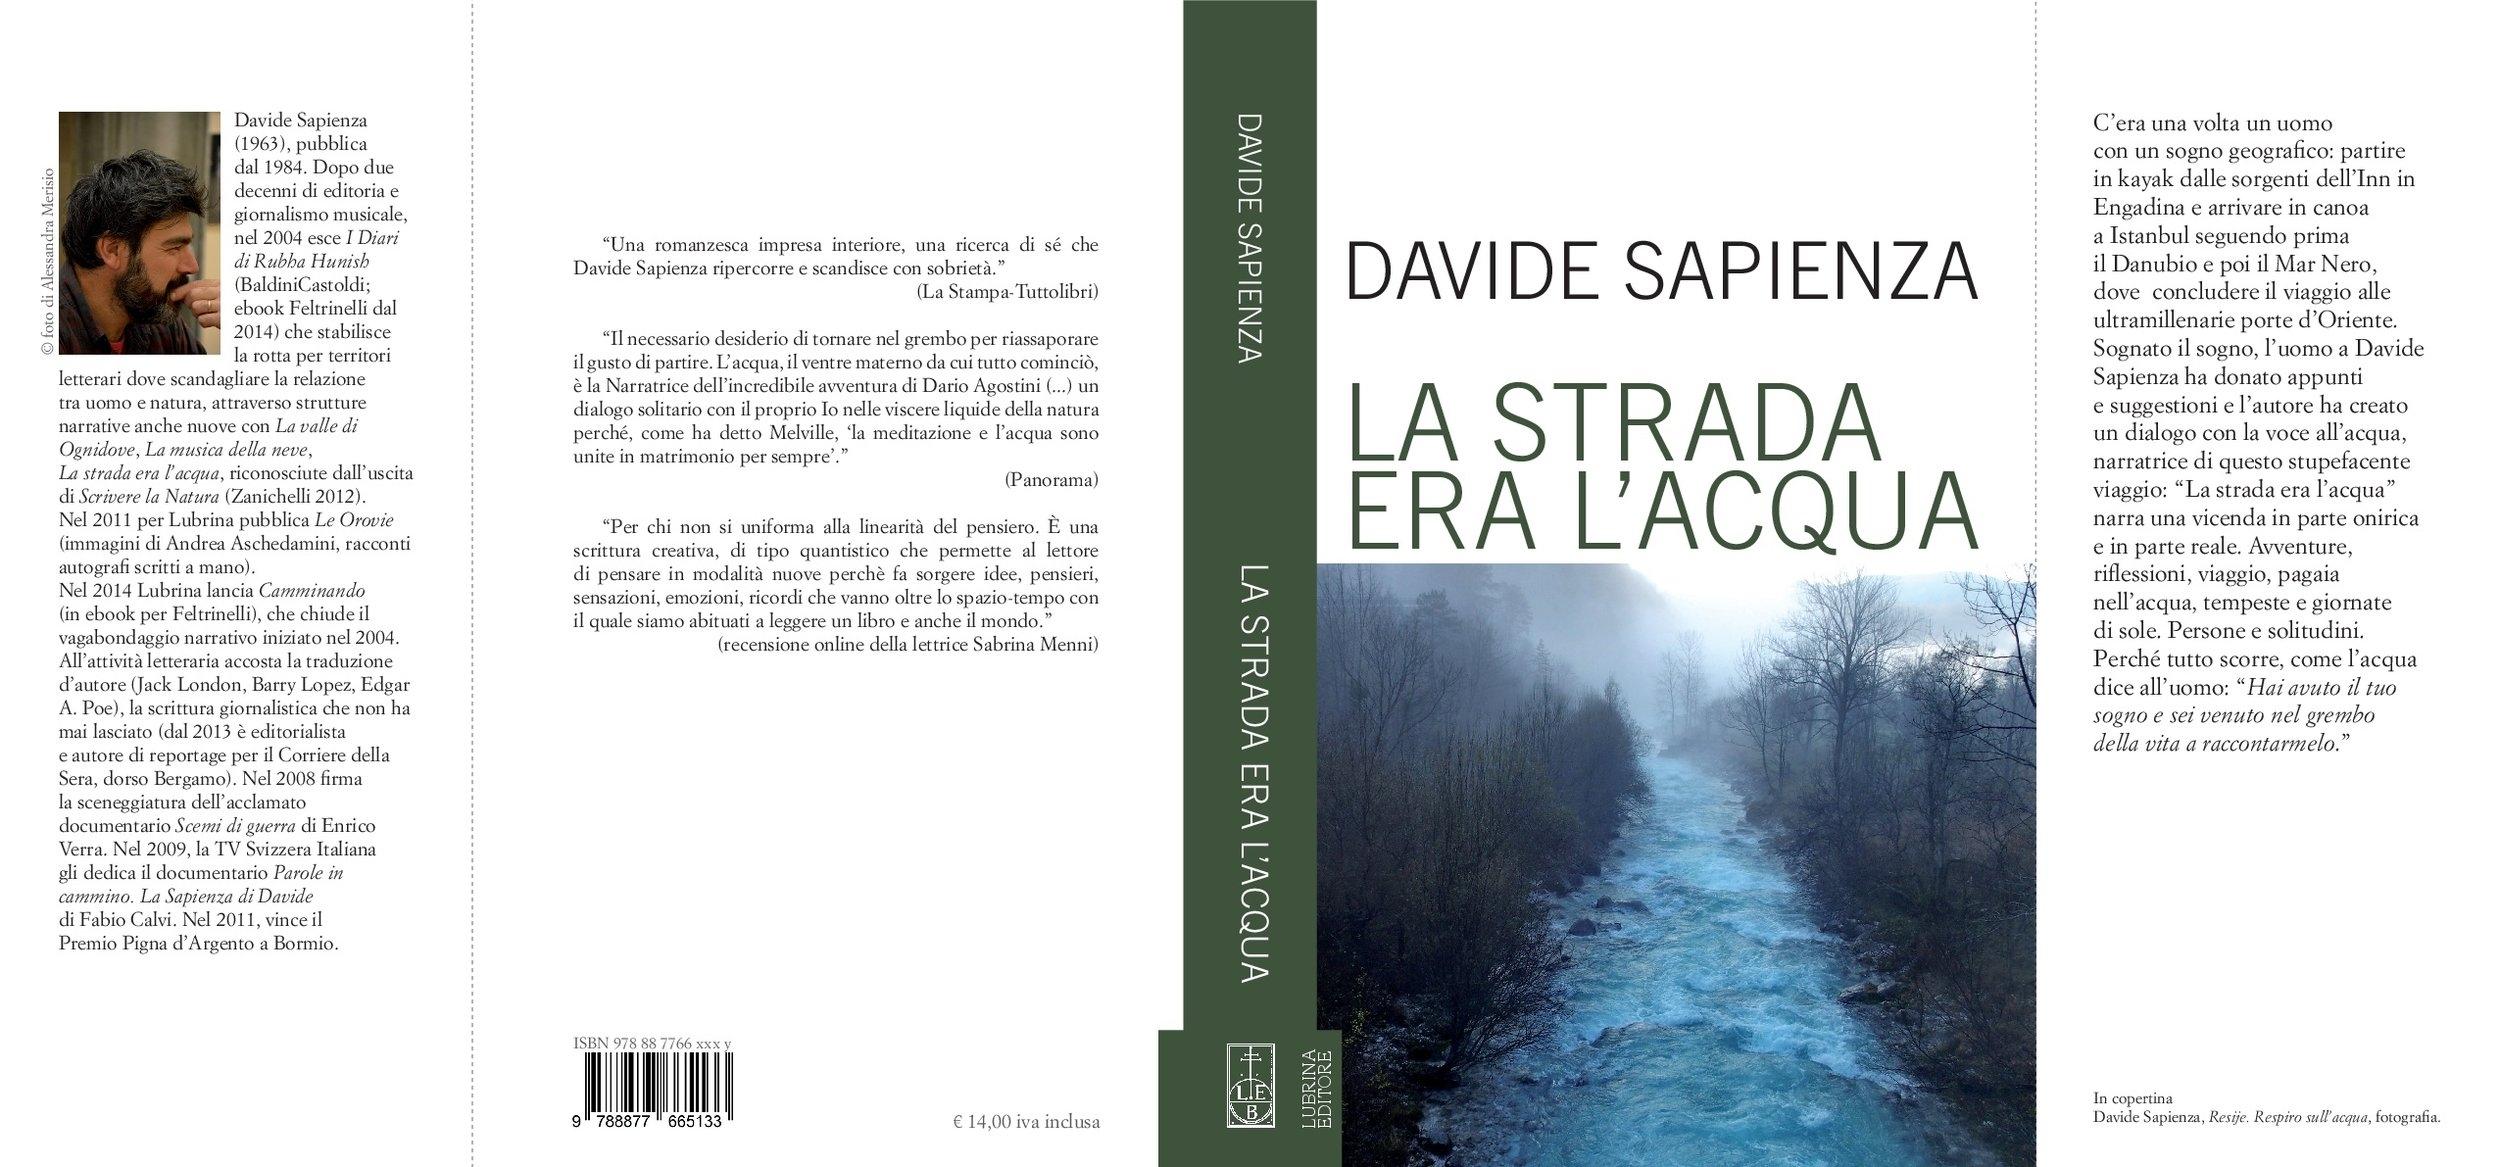 LA STRADA ERA L'ACQUA copertina stesa2.jpg